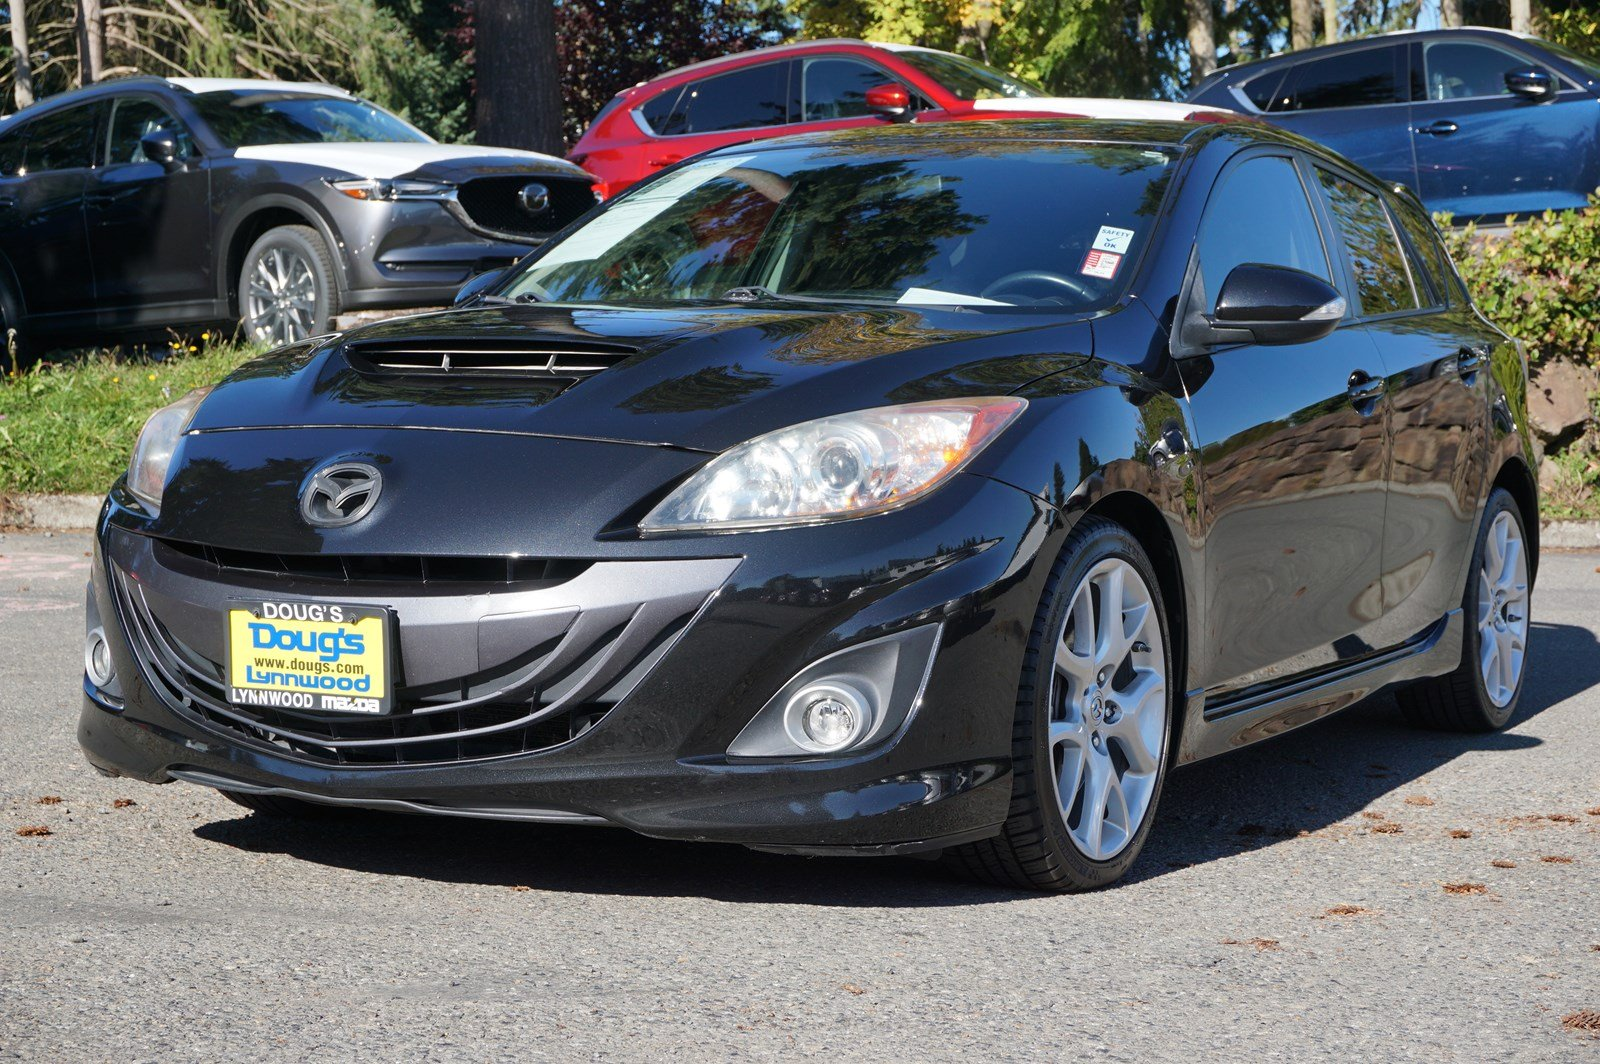 Mazdaspeed3 For Sale >> Used 2011 Mazda Mazdaspeed3 For Sale Near Seattle In Edmonds Wa 191008d